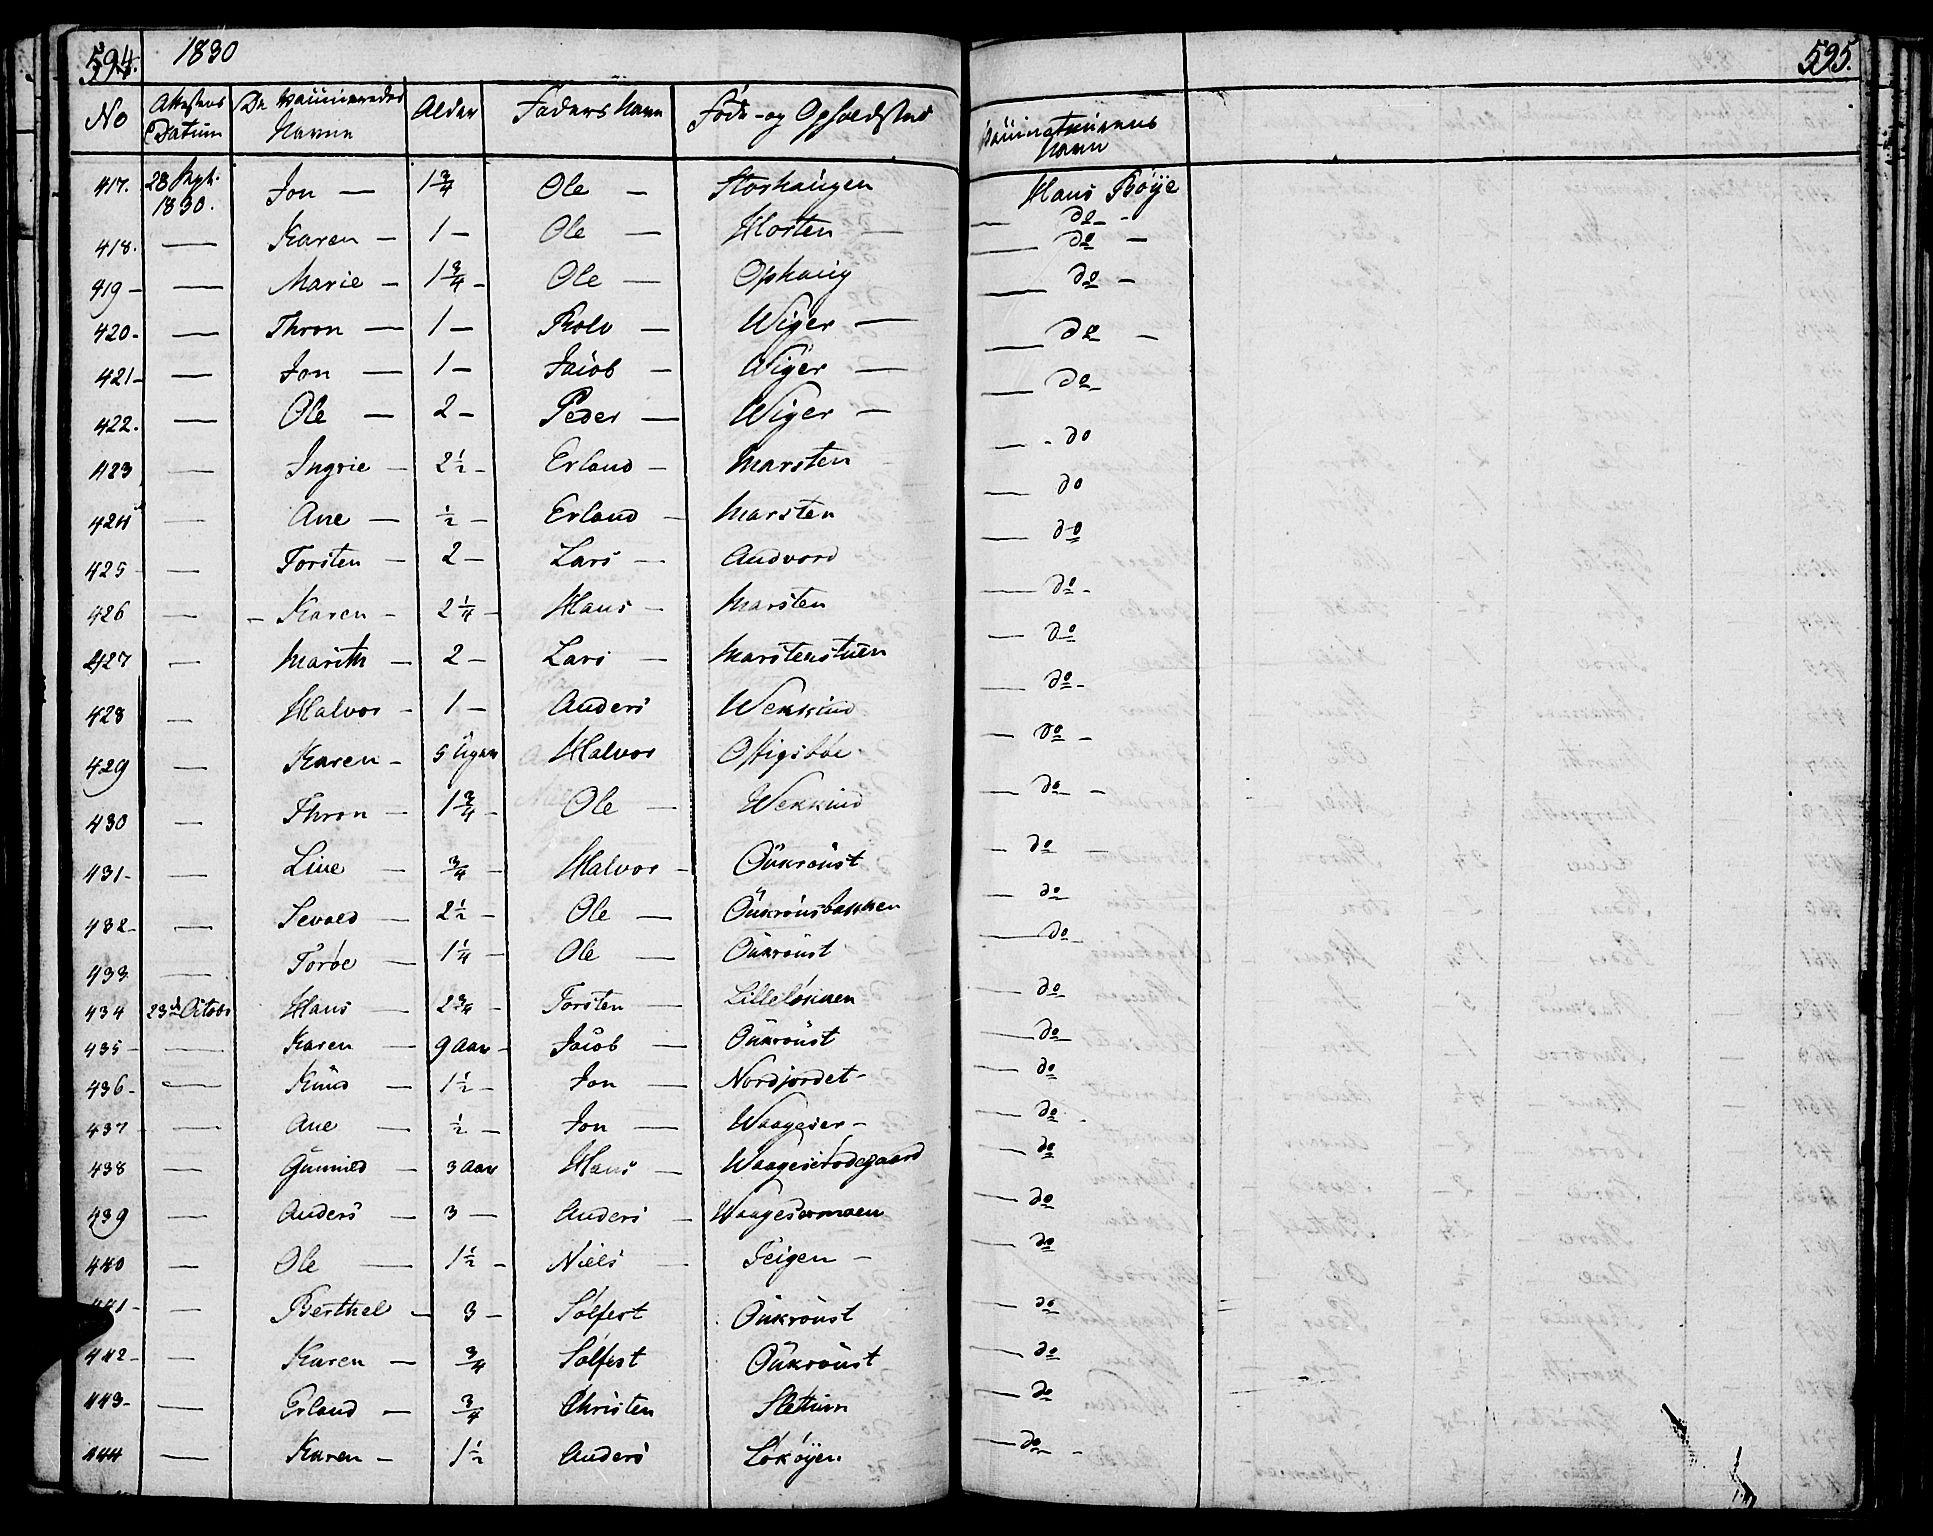 SAH, Lom prestekontor, K/L0005: Parish register (official) no. 5, 1825-1837, p. 594-595